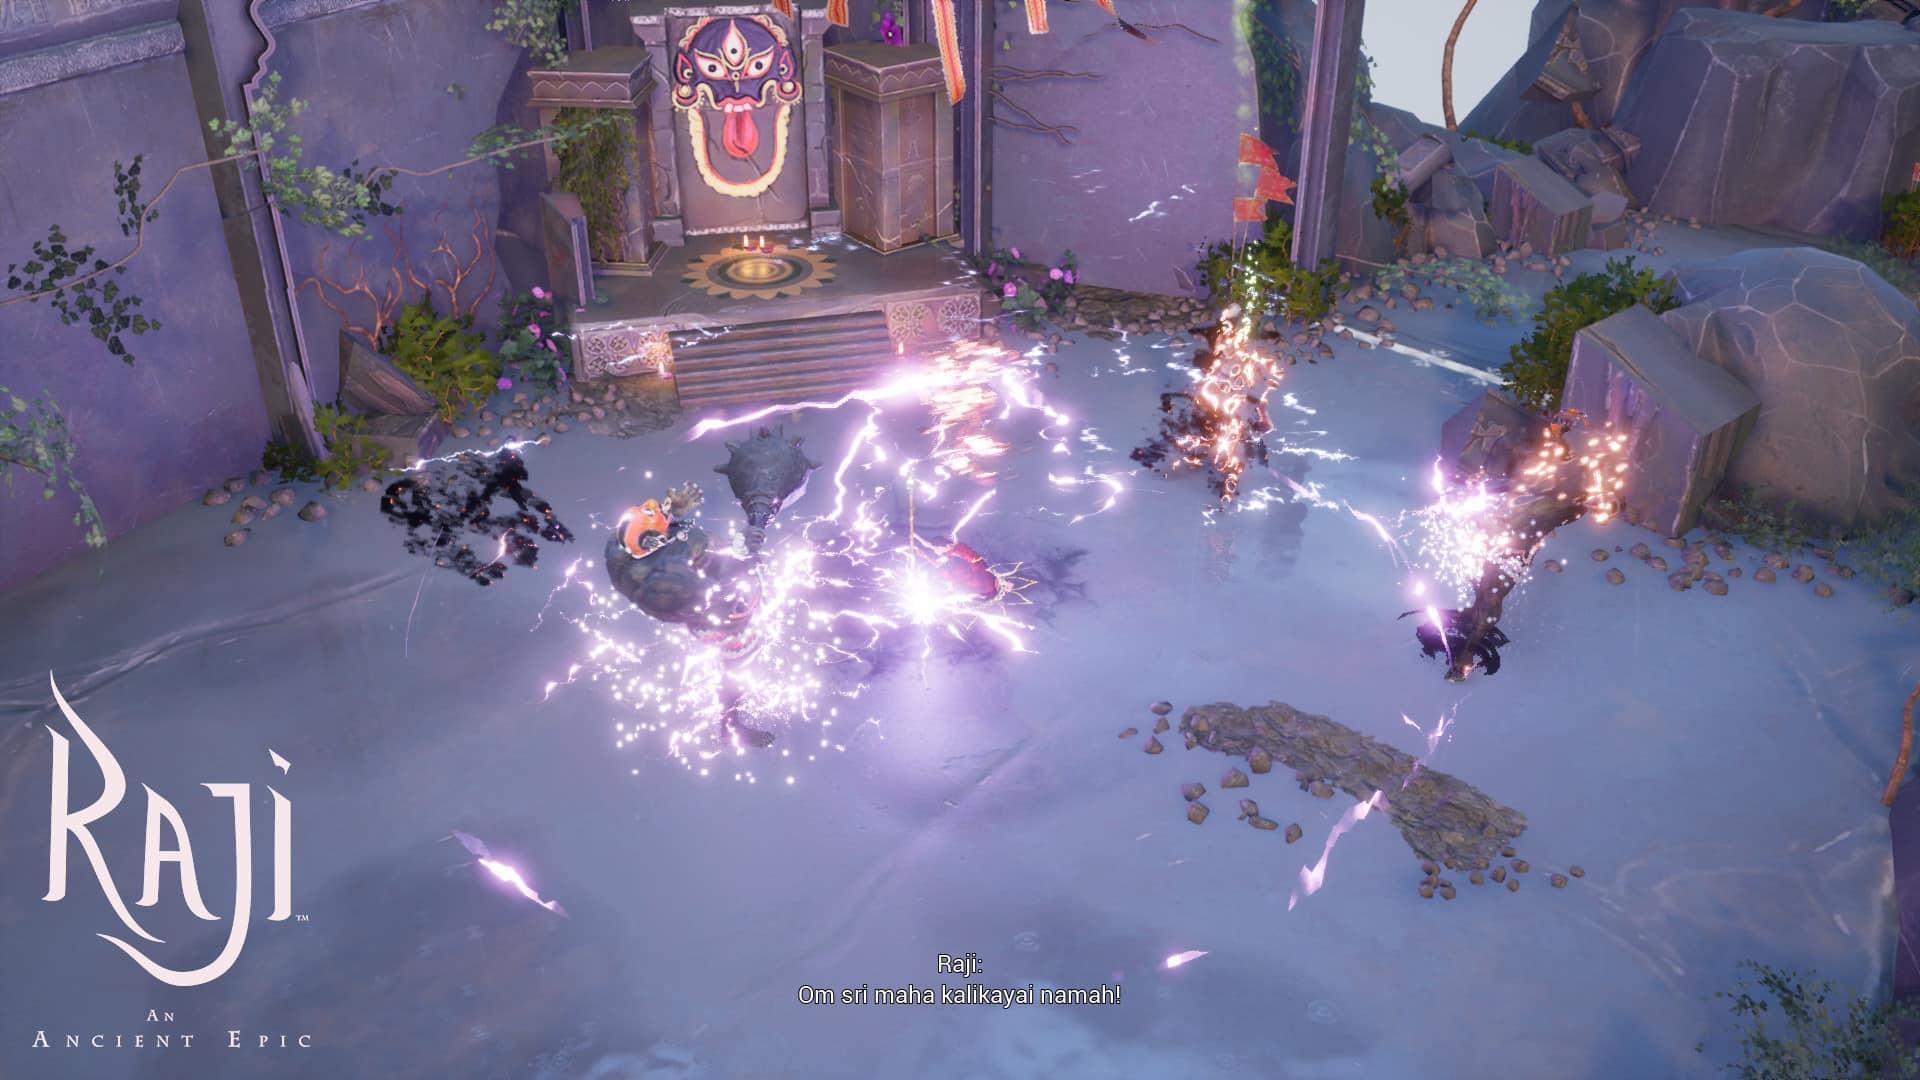 Raji: An Ancient Epic demo Nodding Head Games Gears of War combat in Hindu mythology